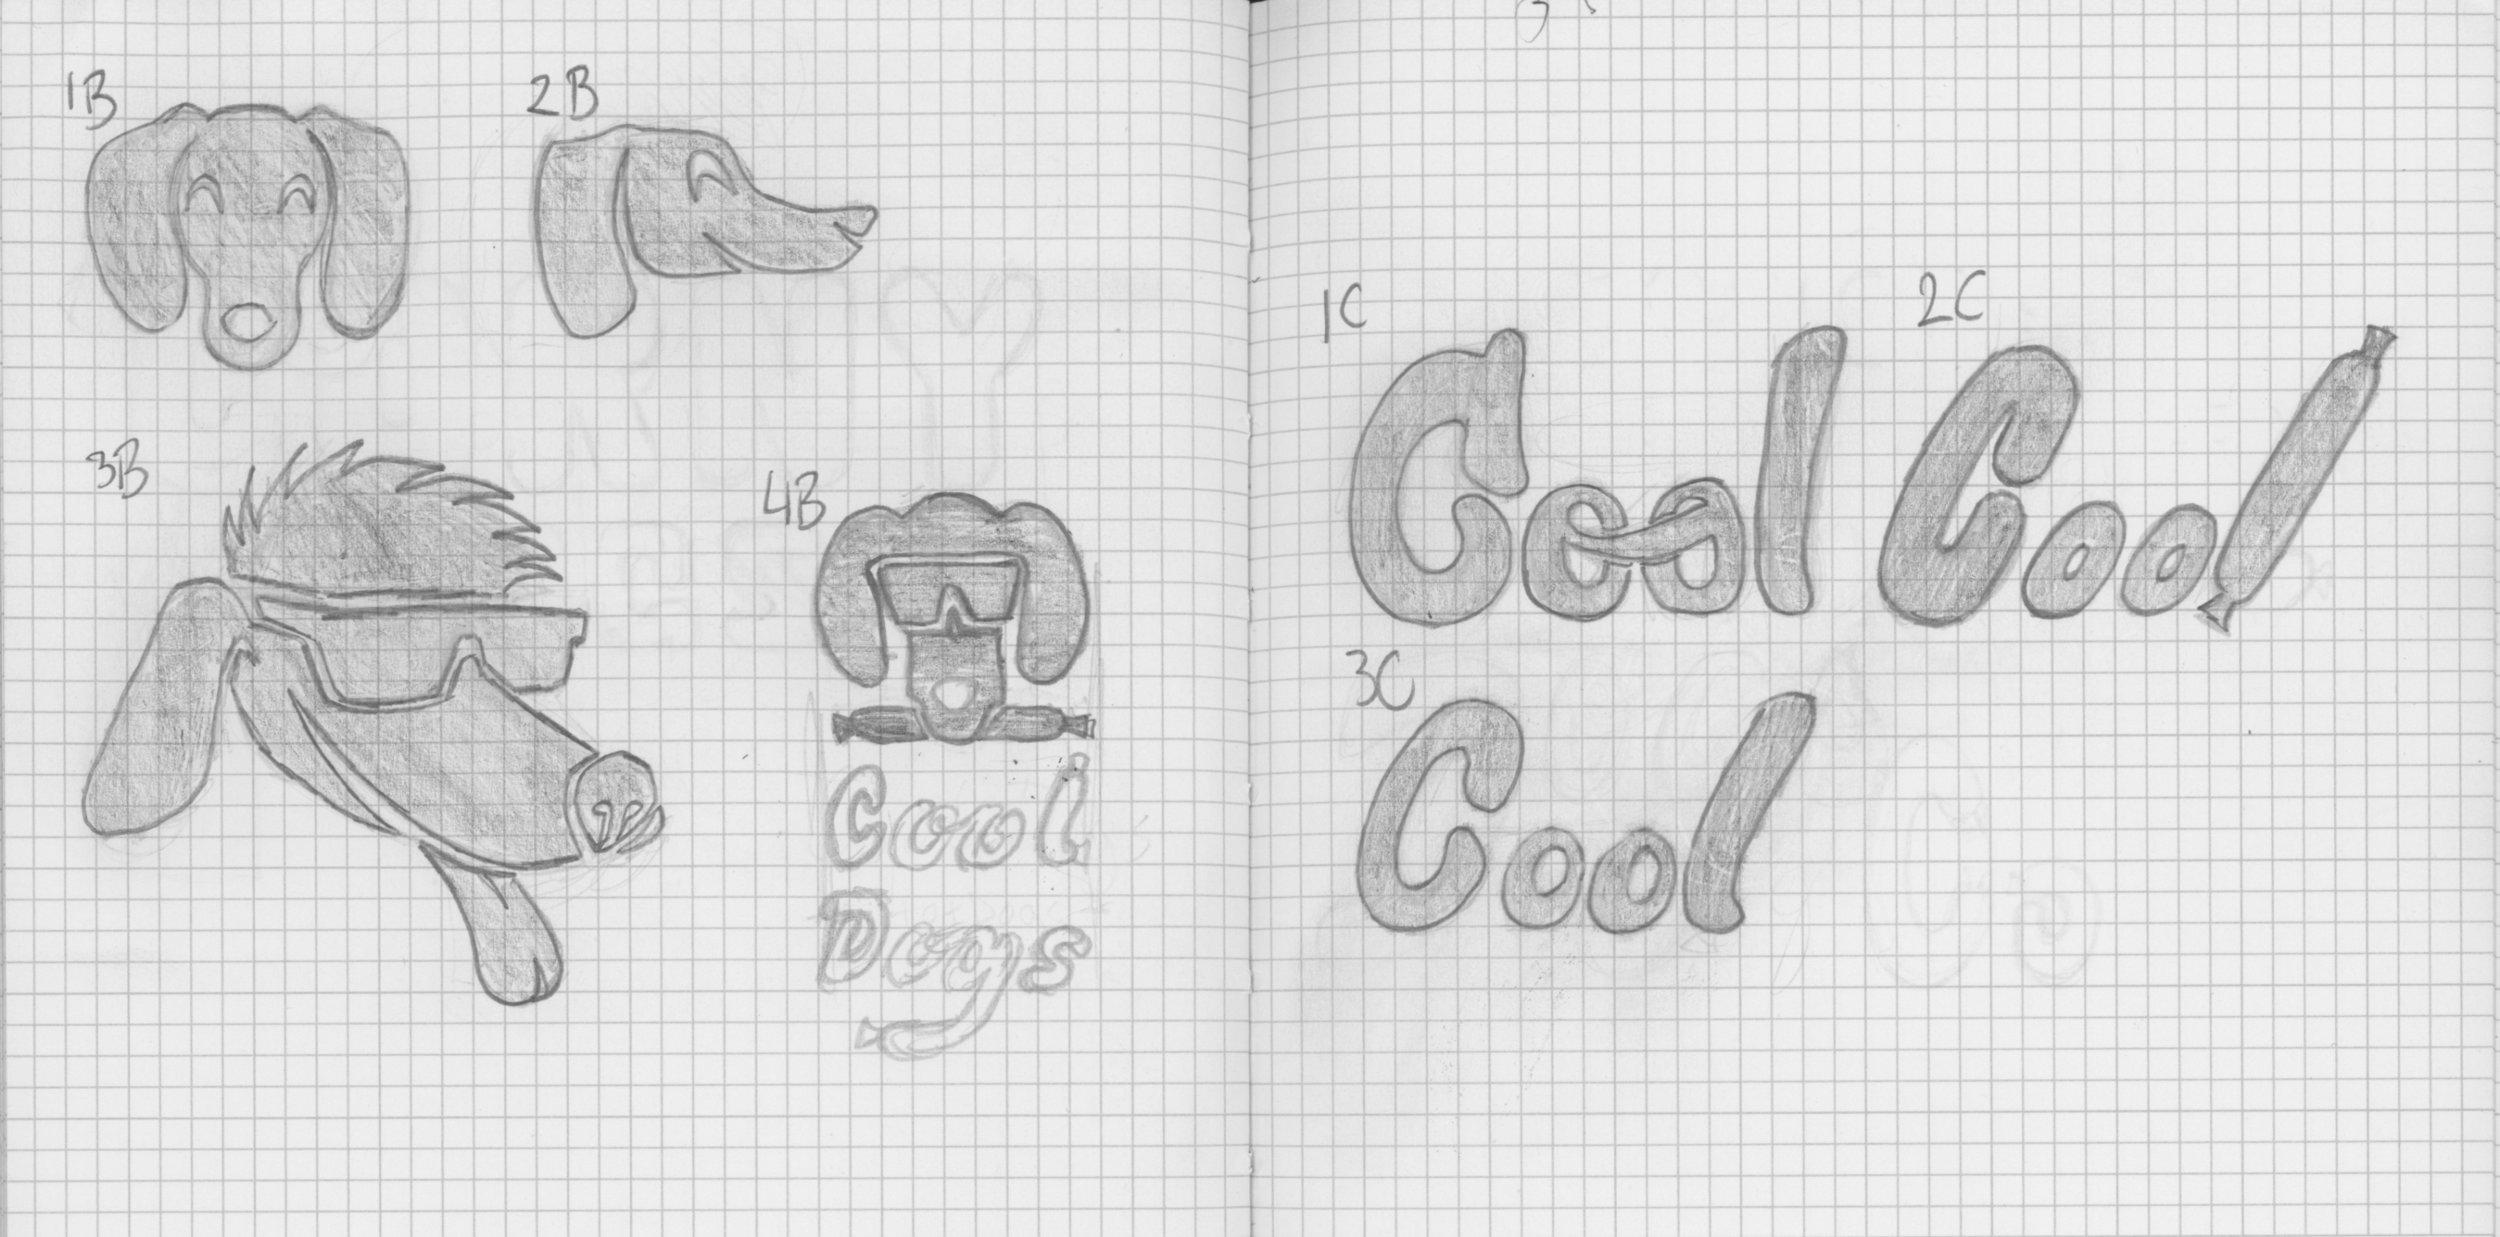 cooldogs-logo-branding-logodesign-hotdog-food-brand-orozcodesign-roberto-orozco-artist-graphicdesign-vegas-lasvegas-foodbrand-sketches2.jpg